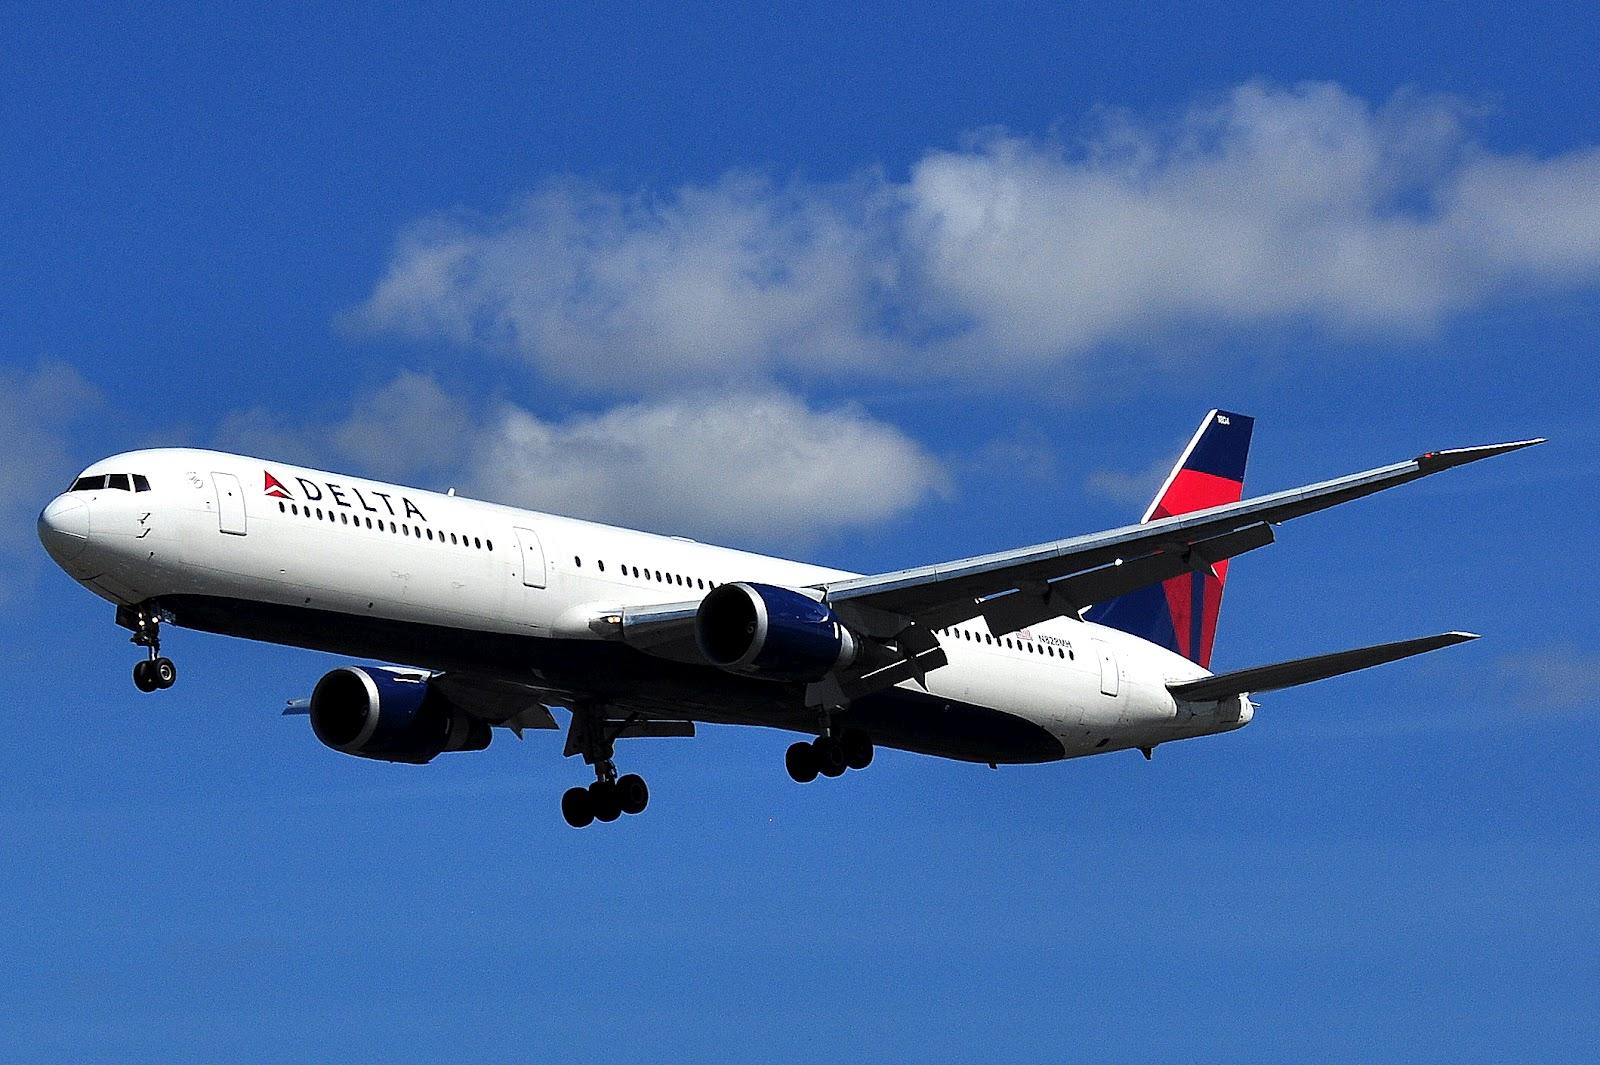 http://3.bp.blogspot.com/-wzx3IMtP_7U/T_mN85R50NI/AAAAAAAAKk4/wbP0Igq41DI/s1600/boeing_767-400_delta_airlines.JPG